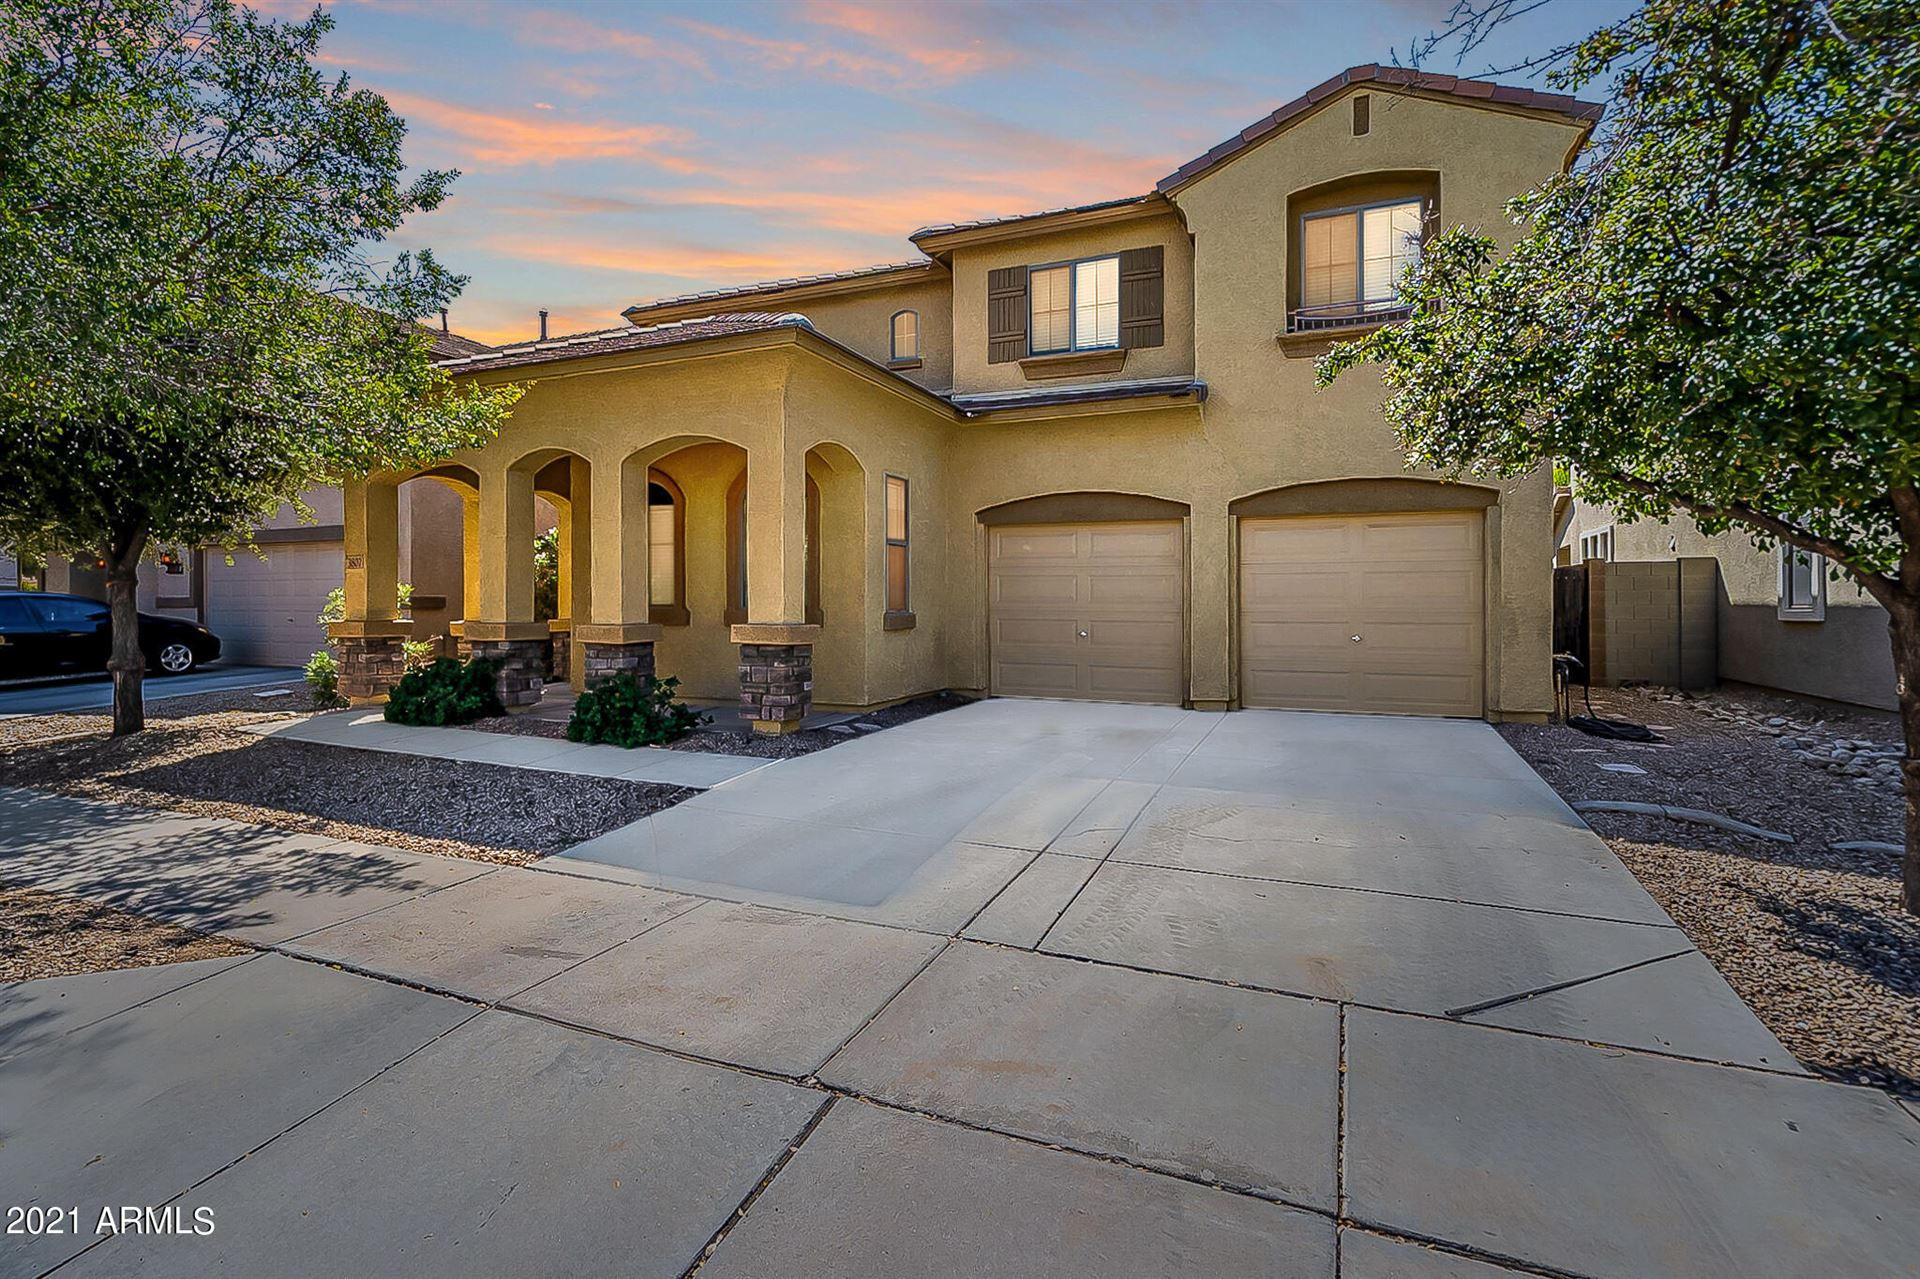 Photo of 3807 E PARKVIEW Drive, Gilbert, AZ 85295 (MLS # 6307449)